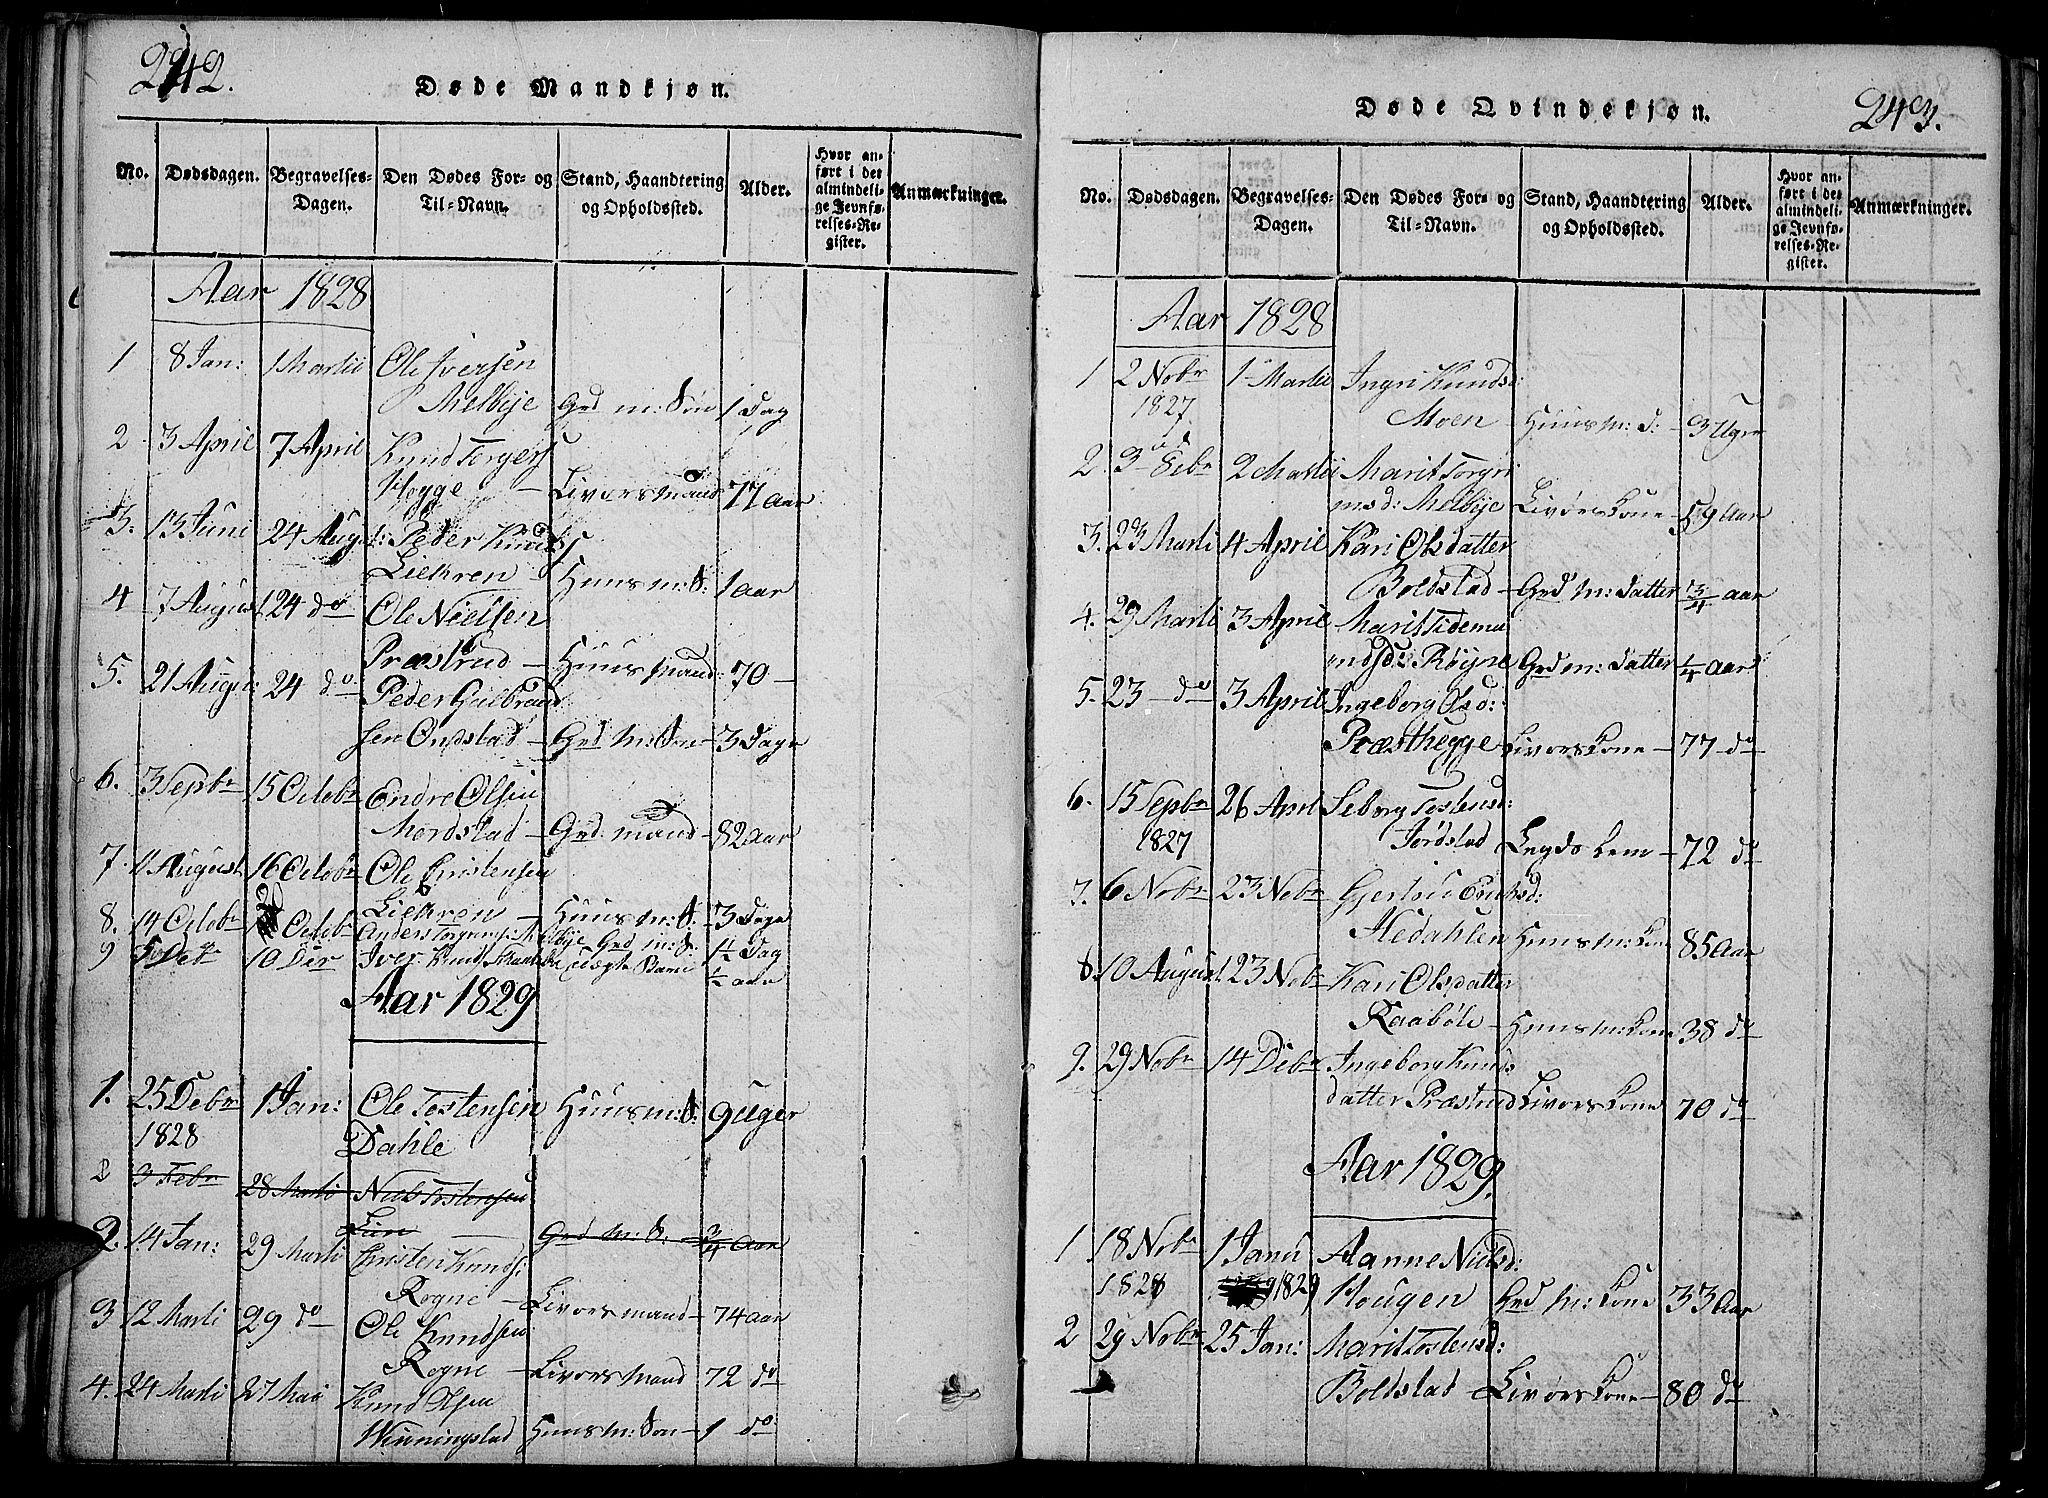 SAH, Slidre prestekontor, Klokkerbok nr. 2, 1814-1839, s. 242-243